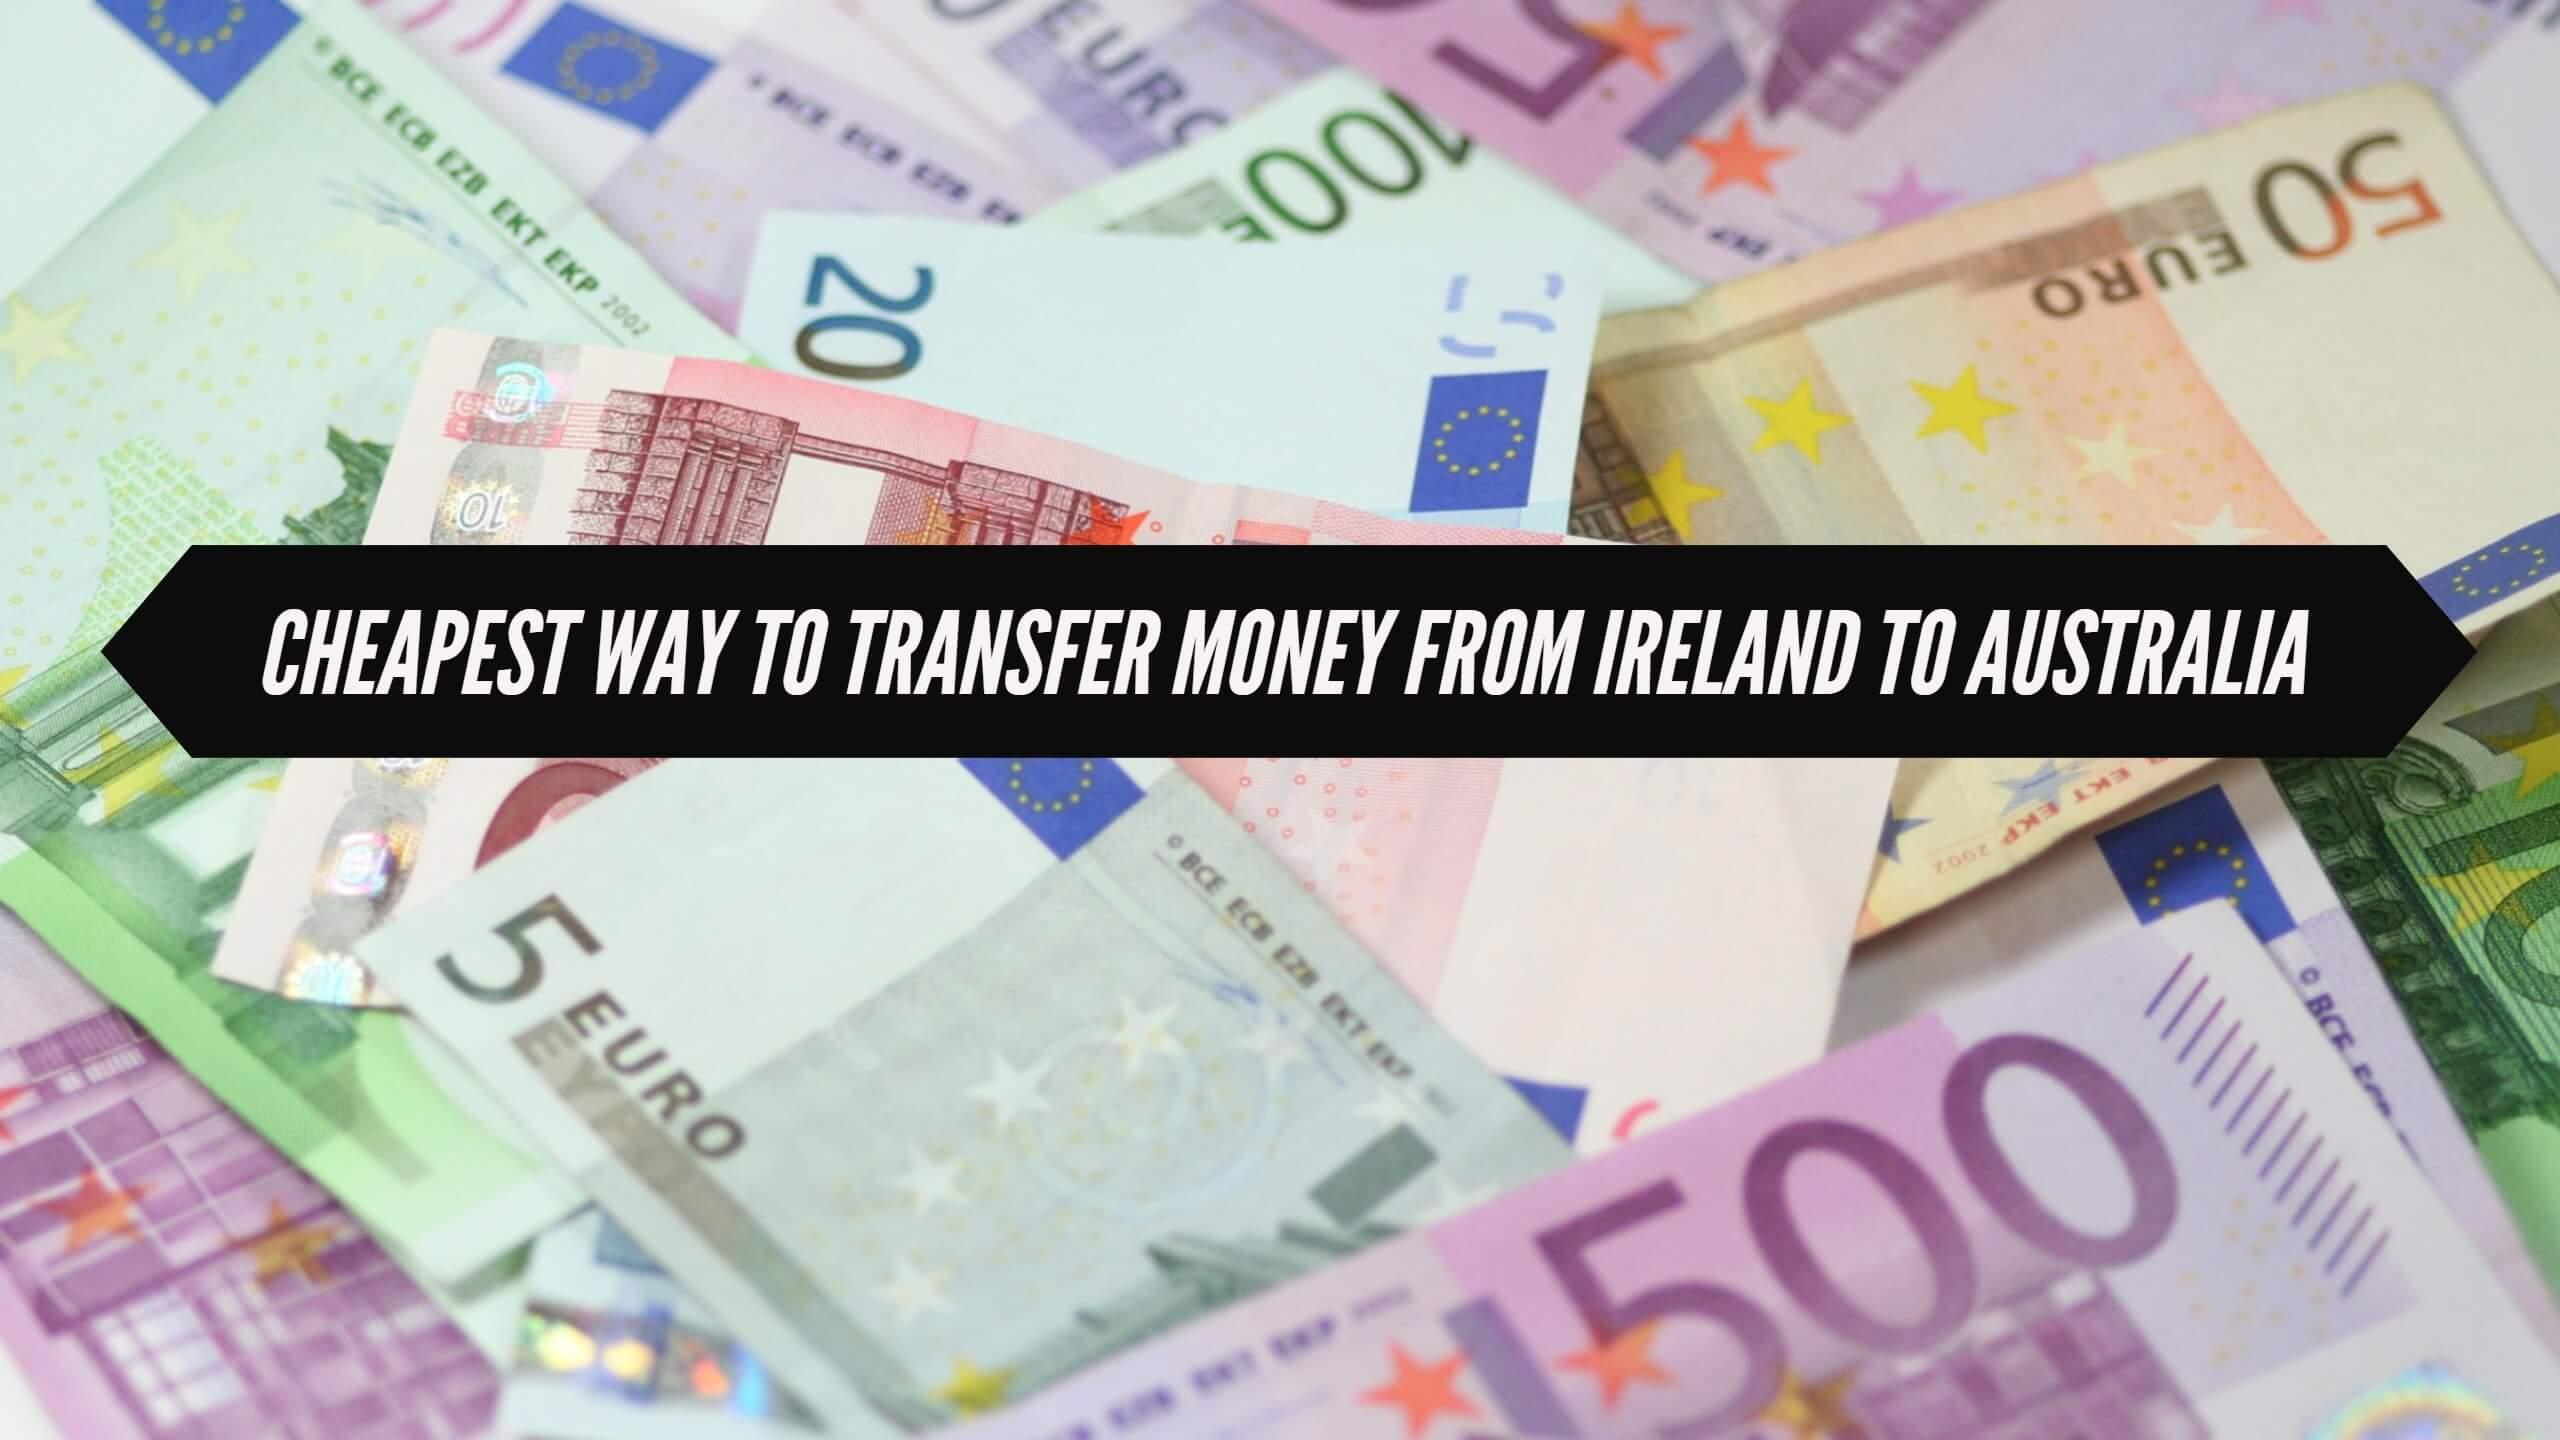 Cheapest Way To Transfer Money From Ireland To Australia